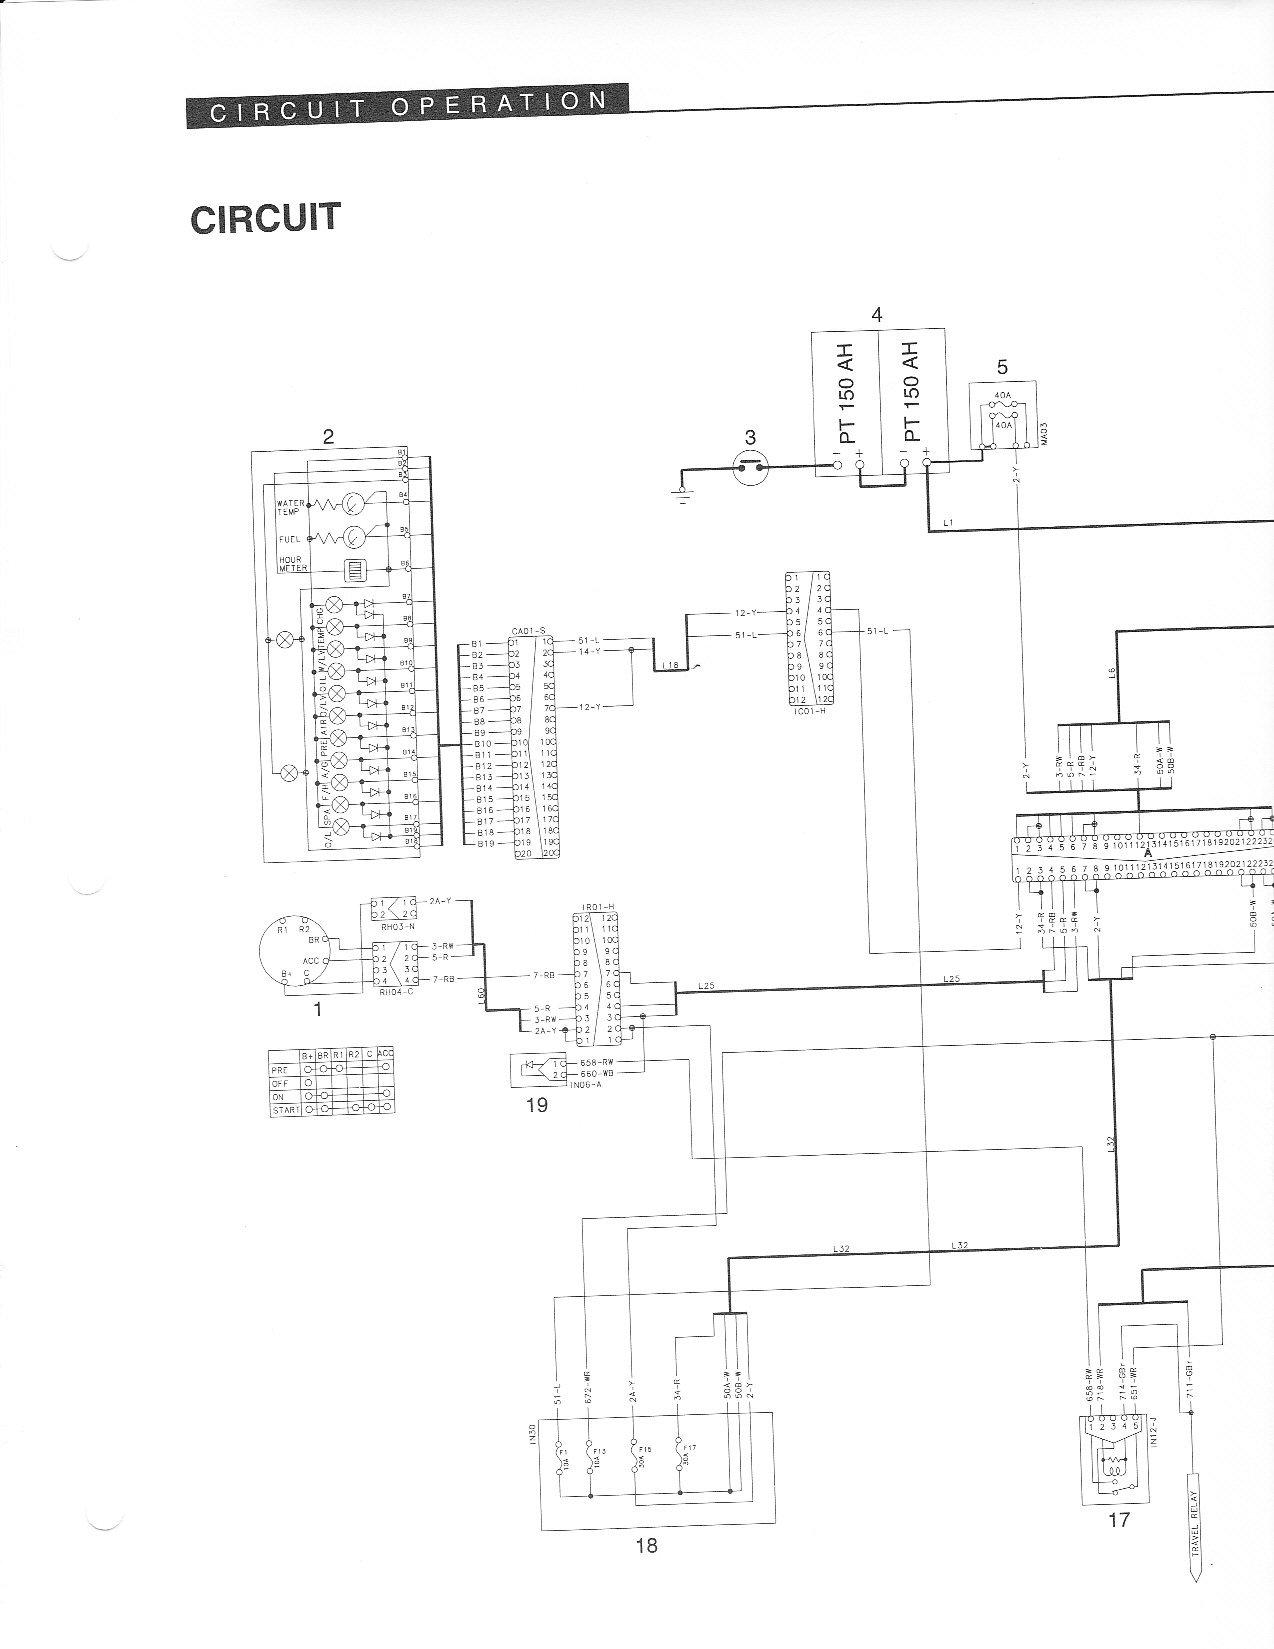 1998 ford contour svt engine diagram 1998 ford econoline